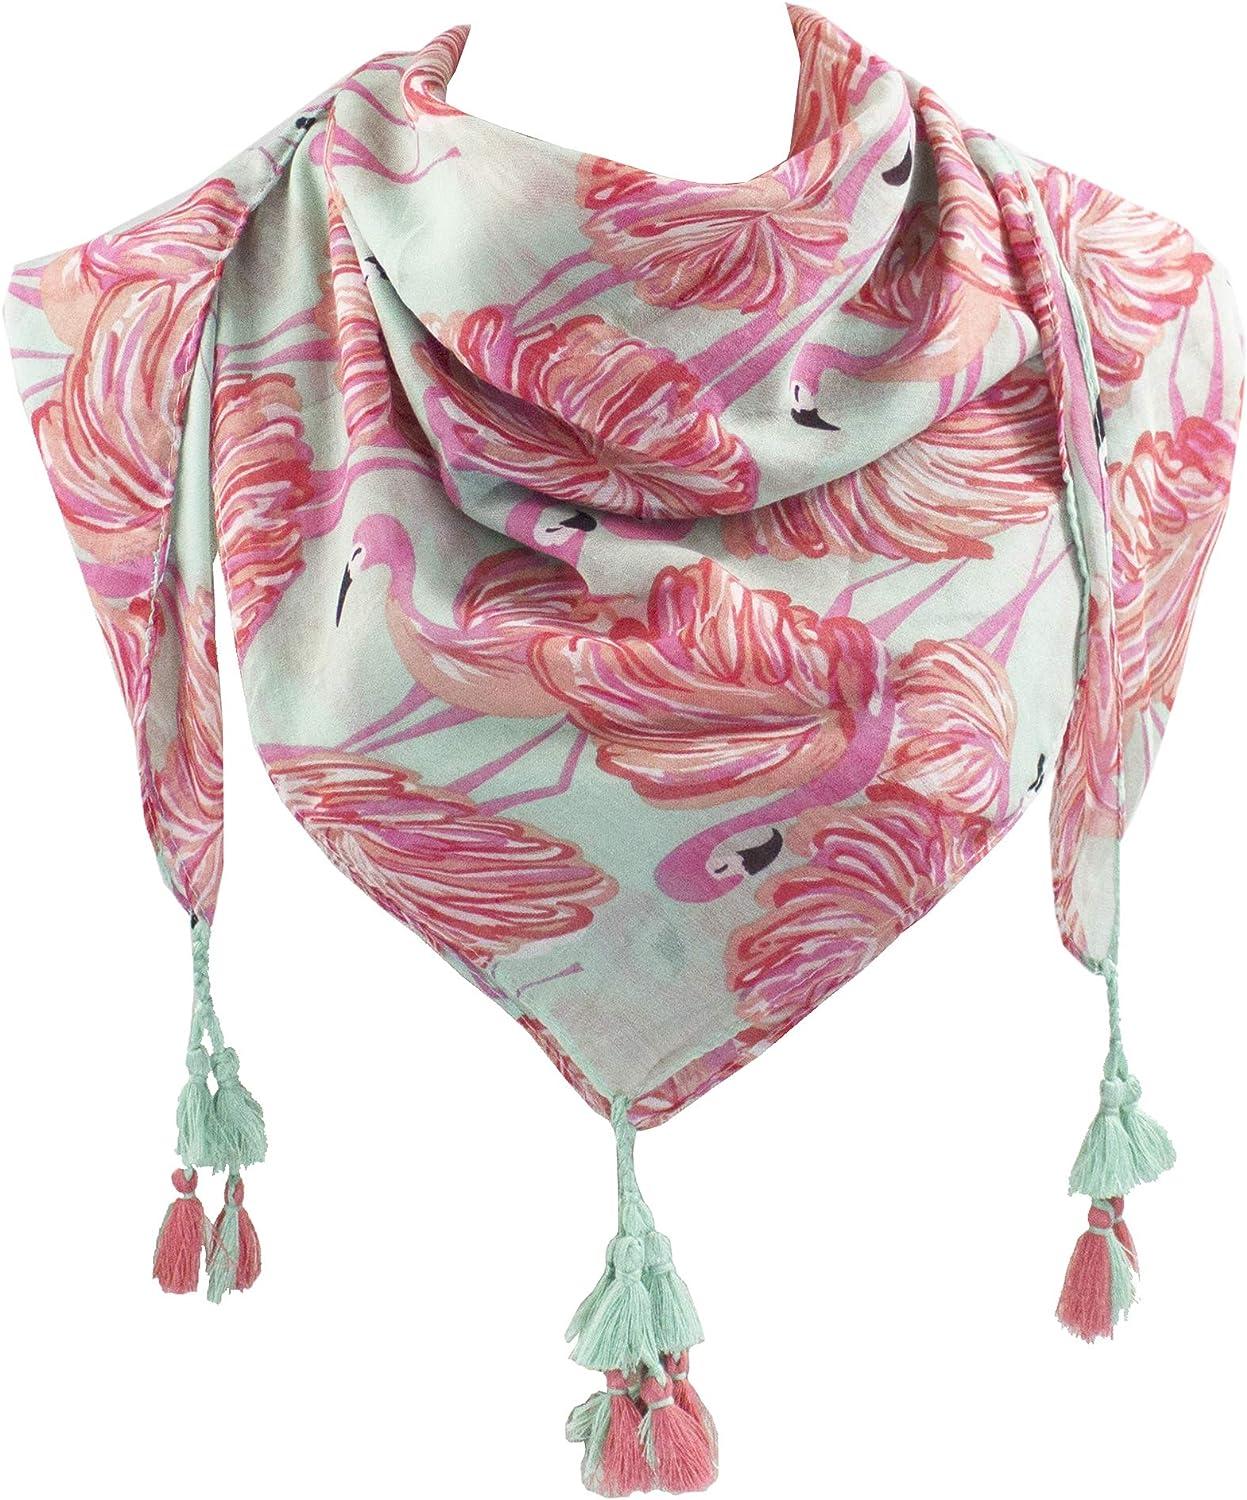 StylesILove Womens Lightweight Trendy Pattern Weave Tassels Square Shawl Scarf Wrap